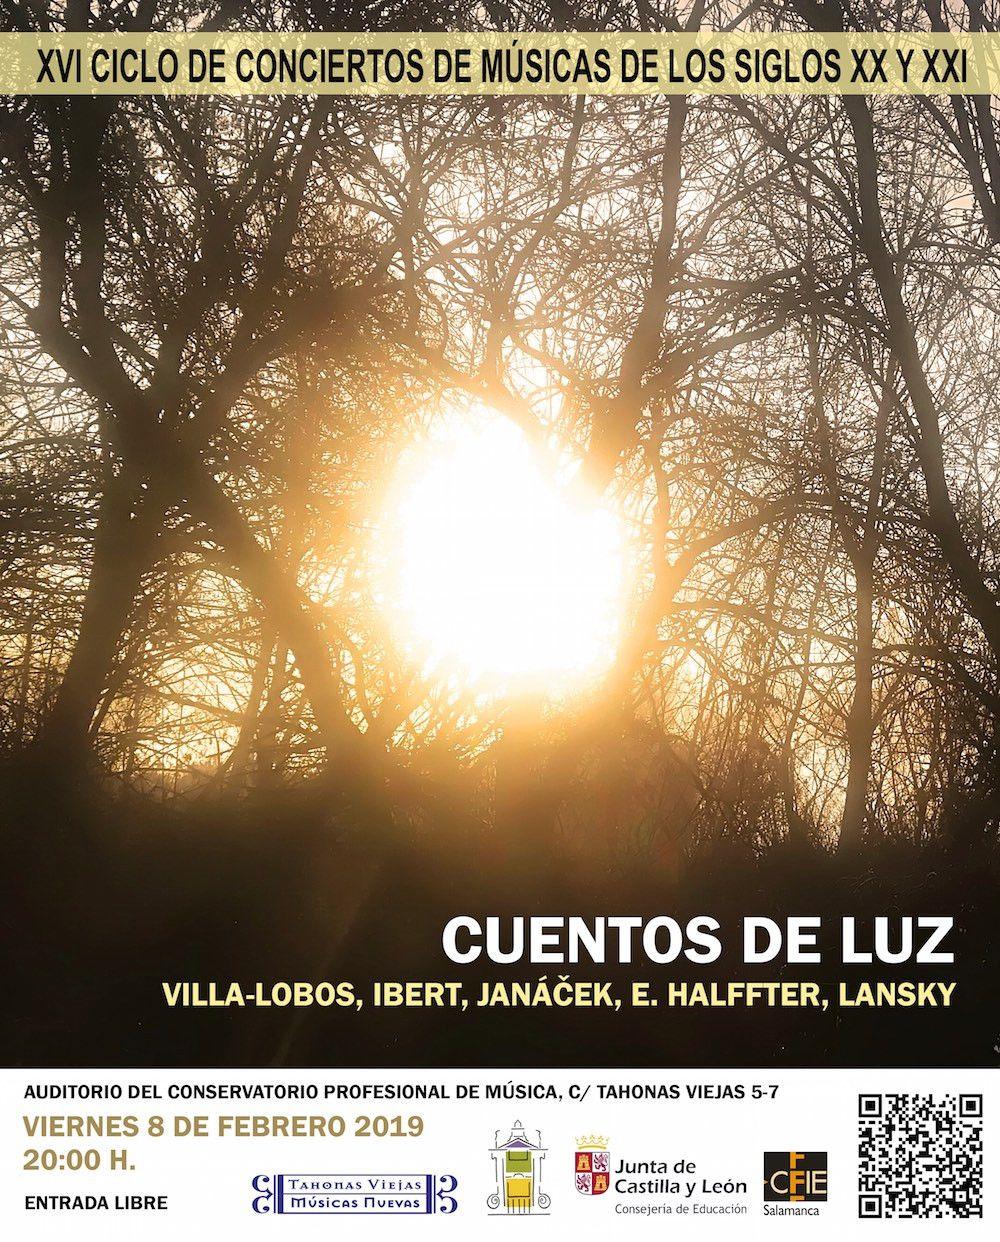 XVI ciclo musicas s XX XXI (01)